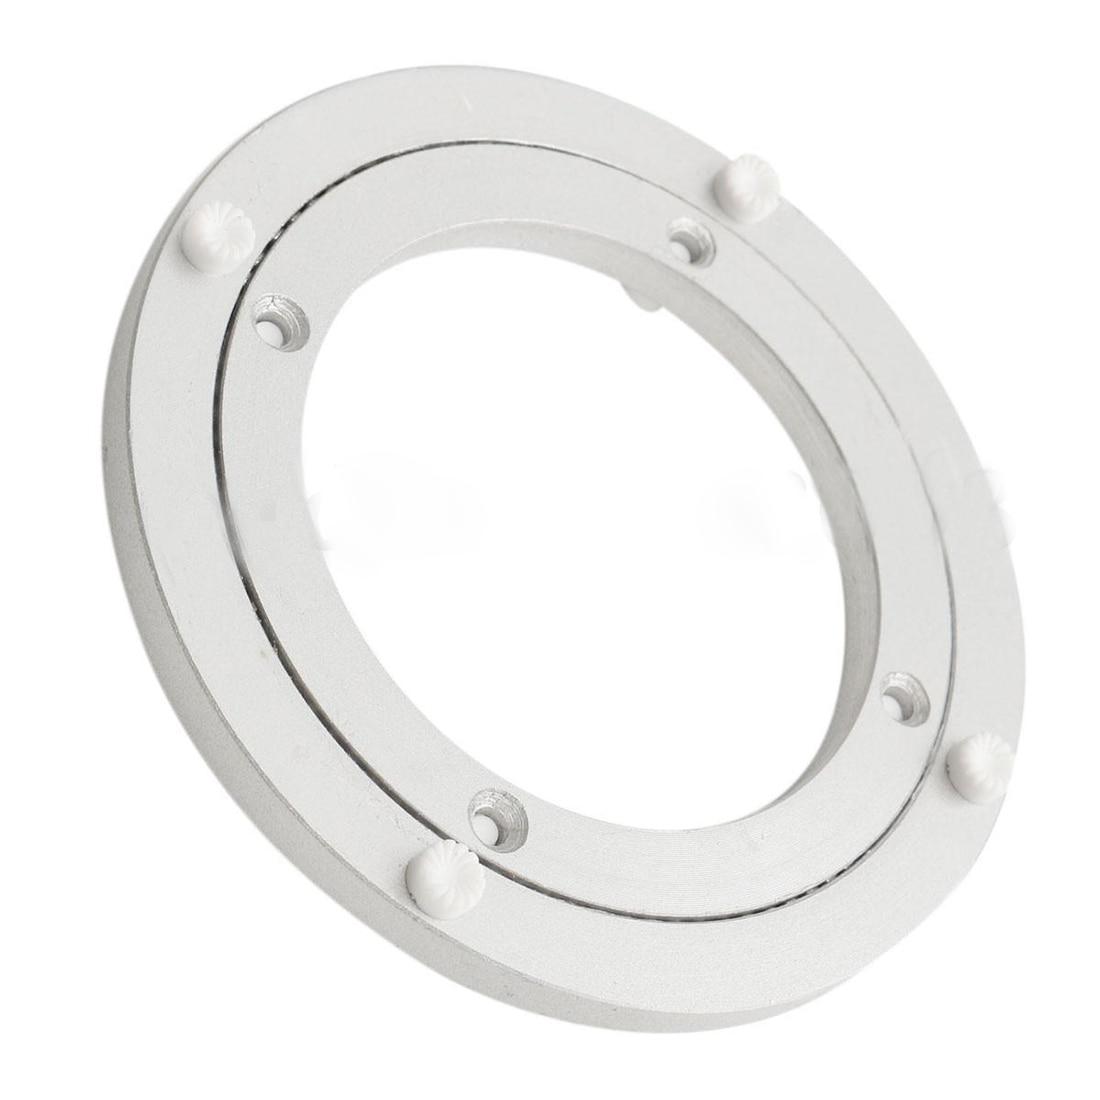 Sinnvoll Heißer-aluminium Rotierenden Drehscheibe Lager Schwenk Platte 5 Zoll Silber Möbel Hardware Swivel Platten